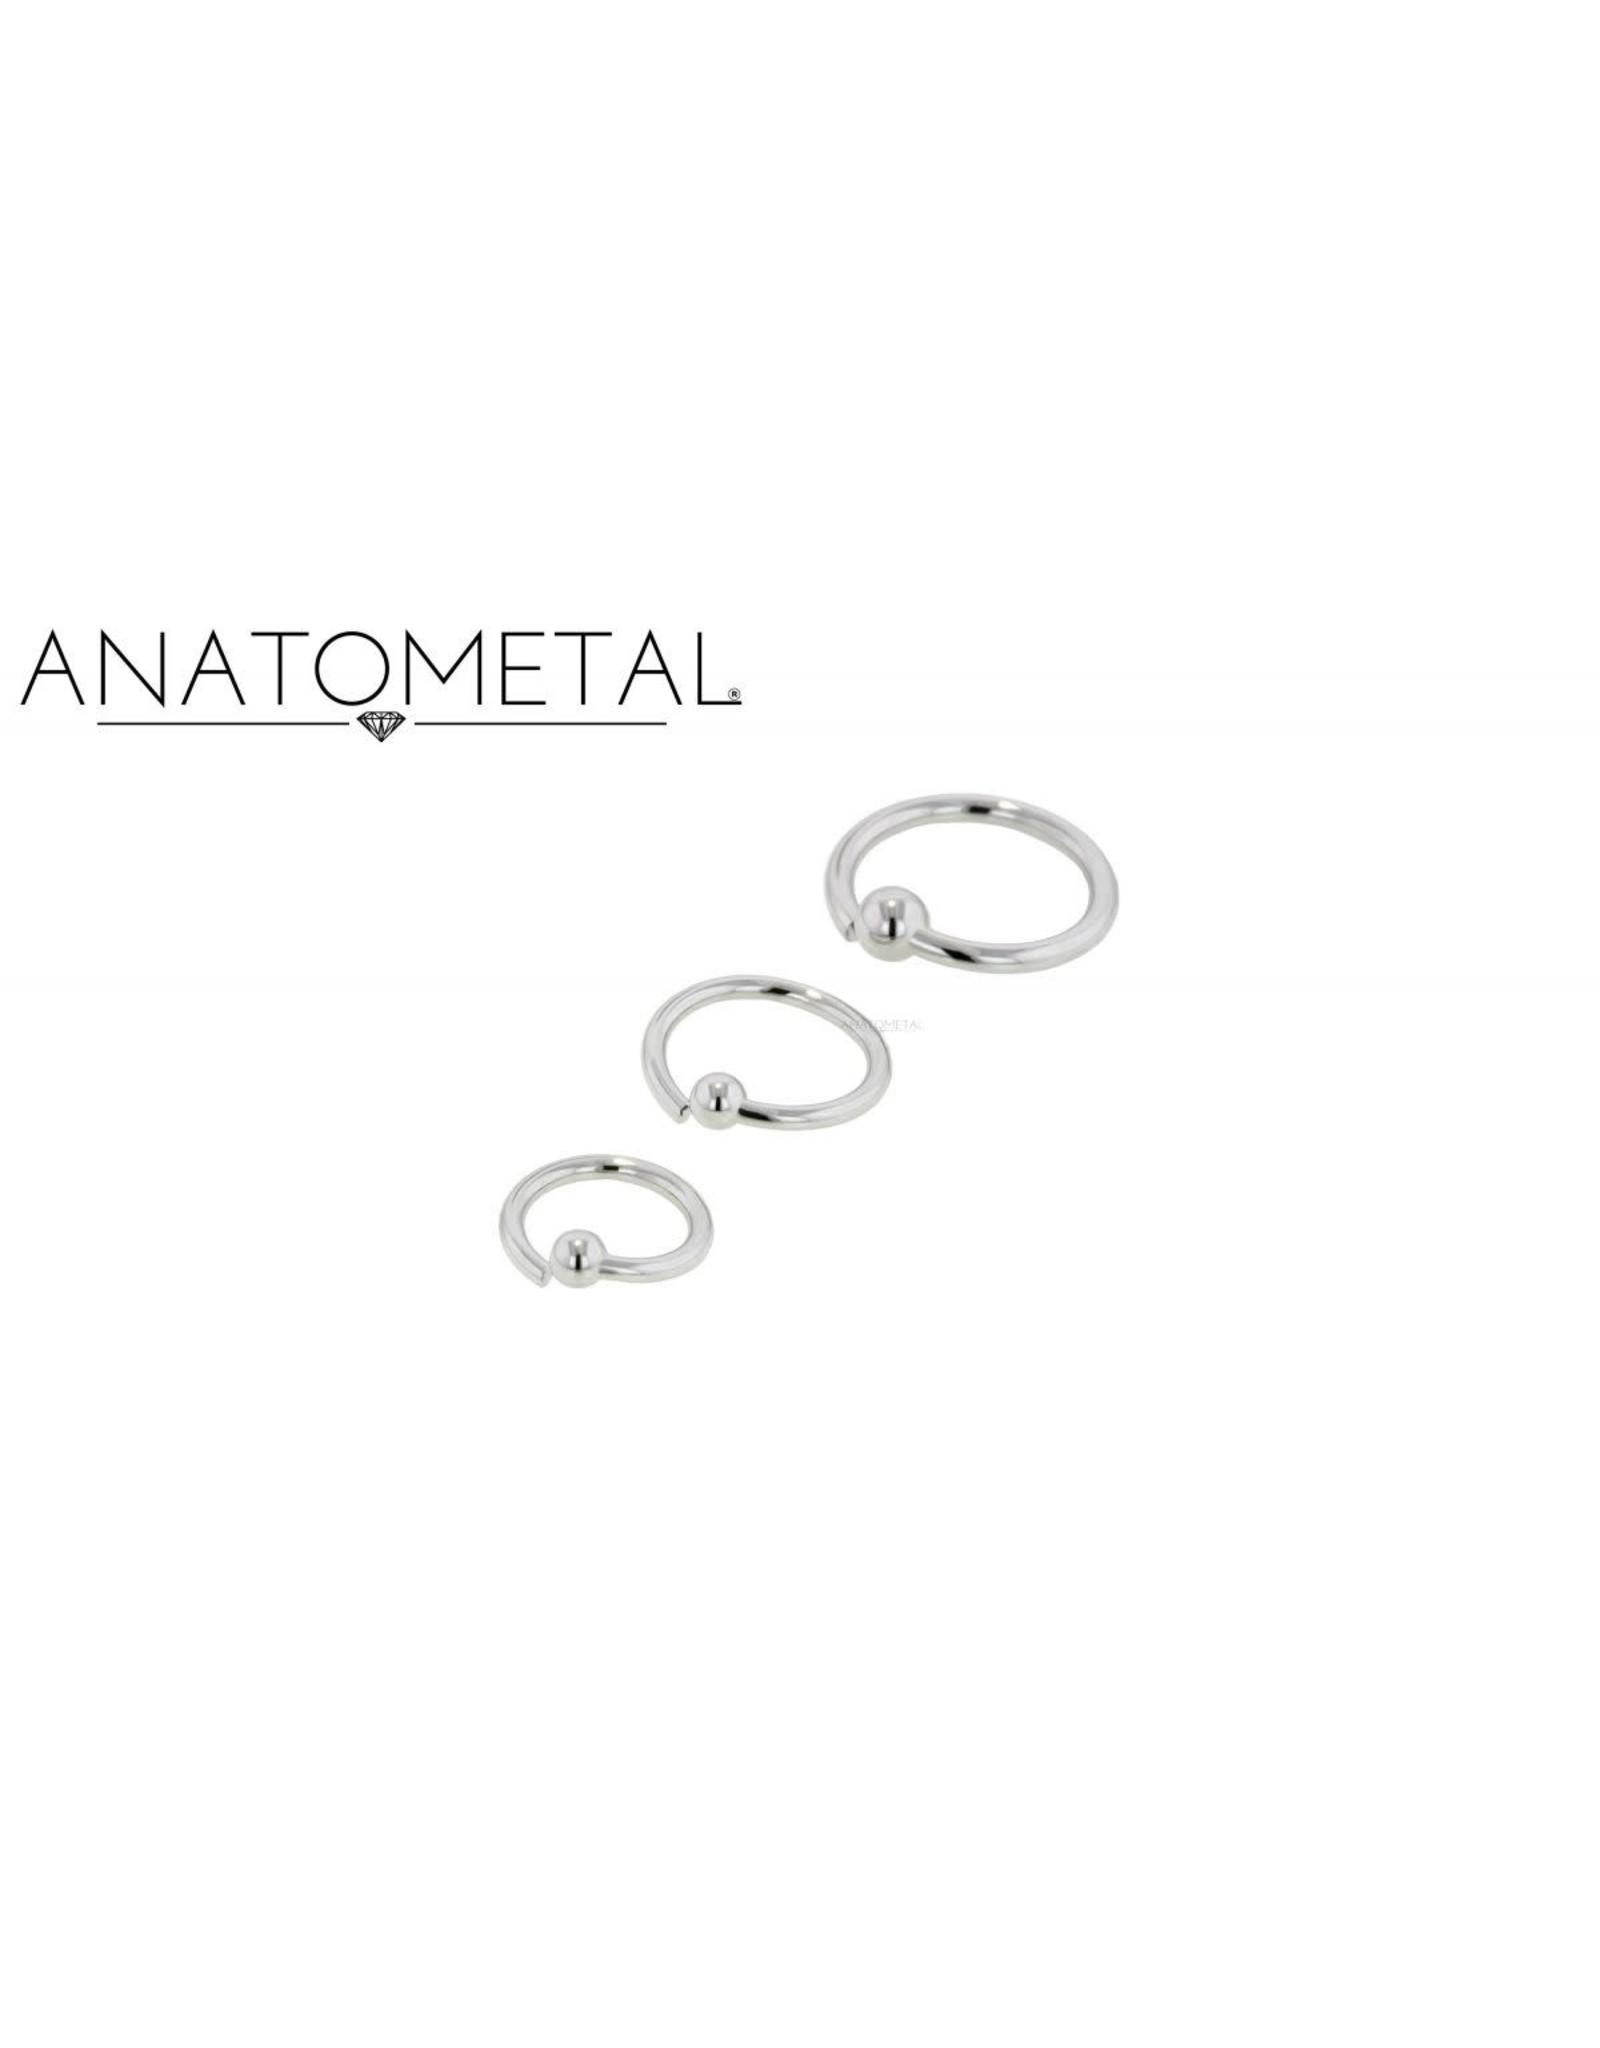 Anatometal Anatometal 18g Steel Fixed Bead Ring